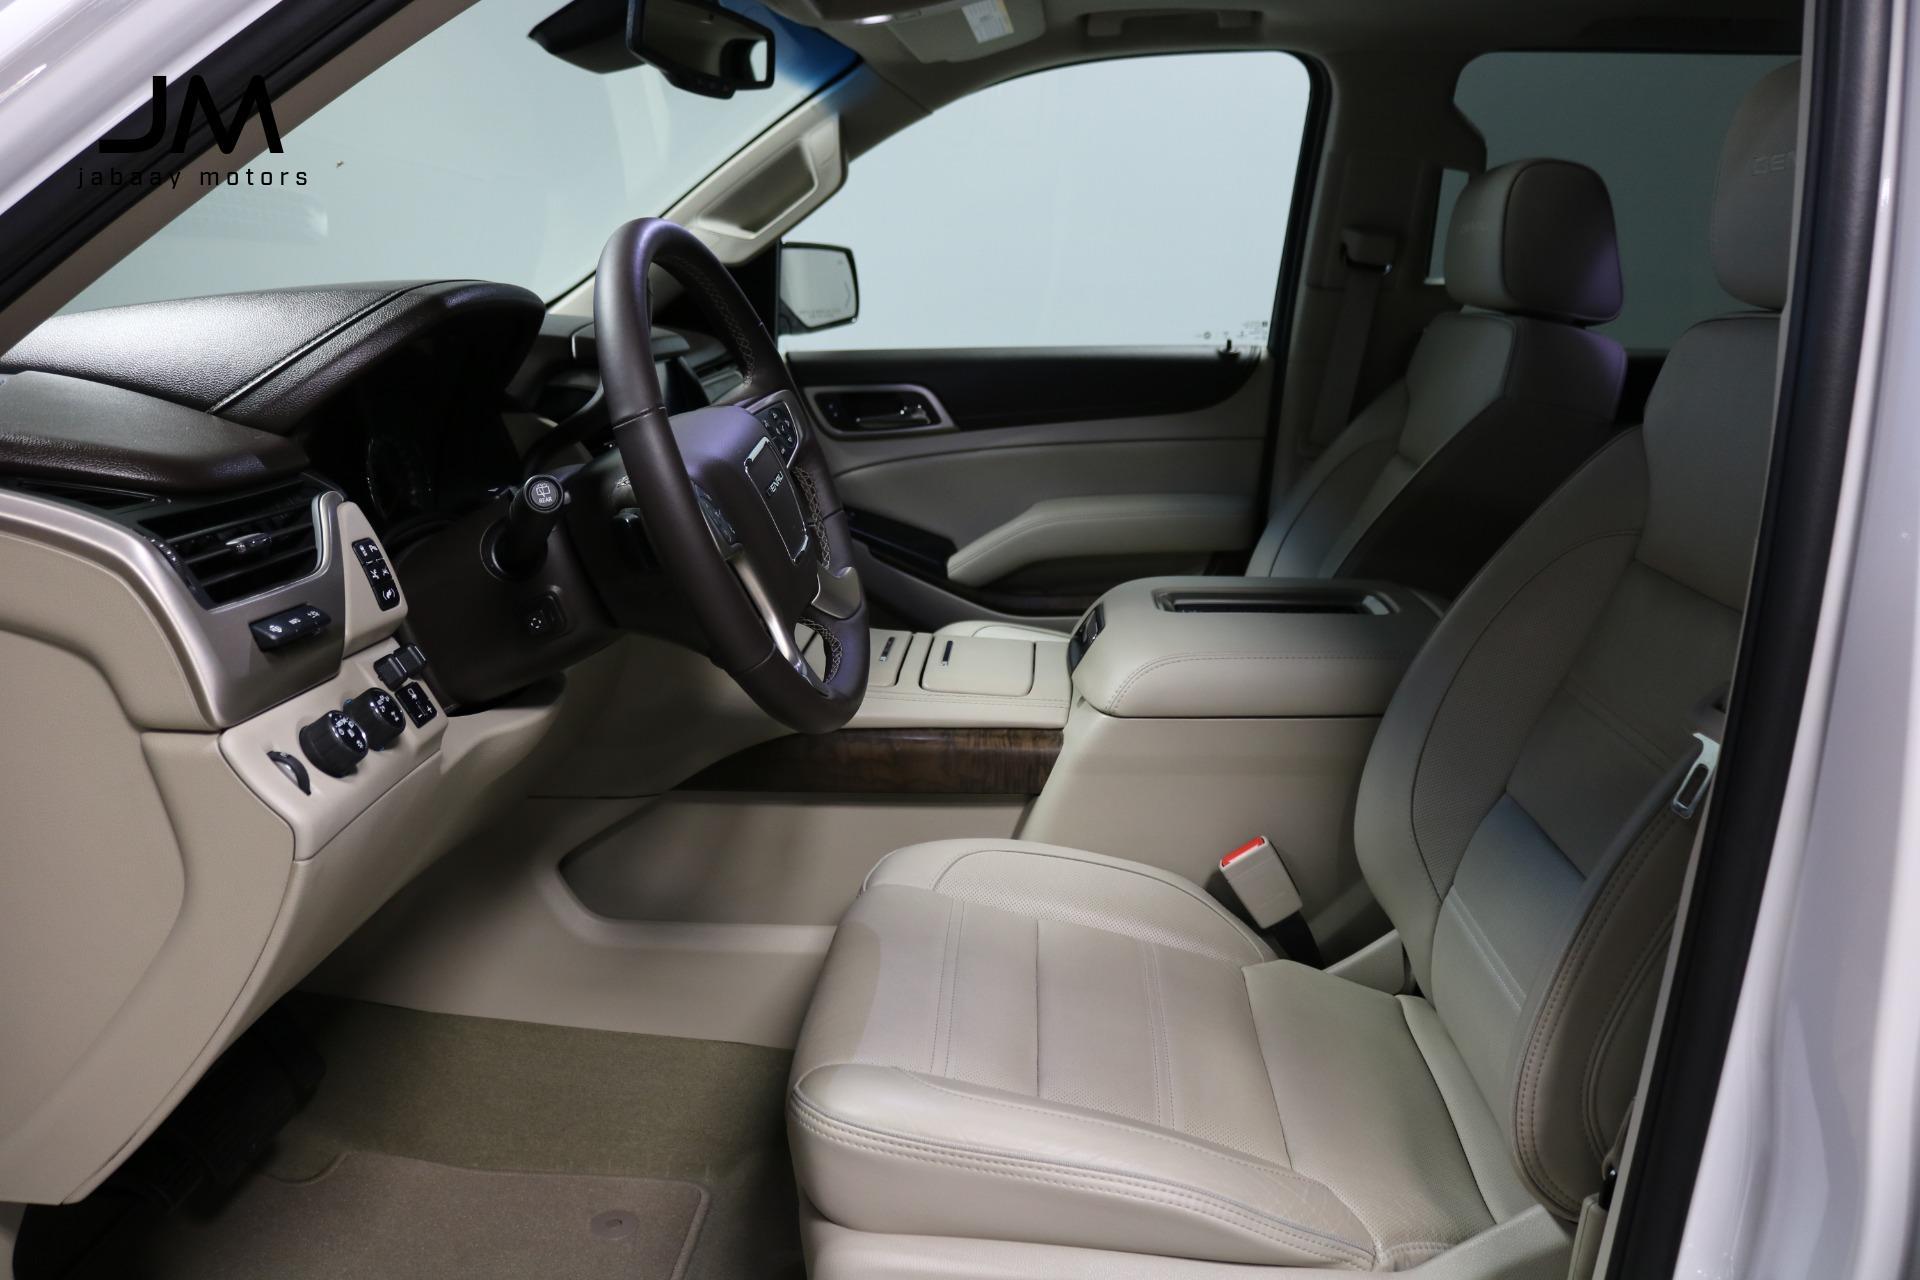 Used 2018 Gmc Yukon Xl Denali For Sale Sold Jabaay Motors Inc Stock Jm7451